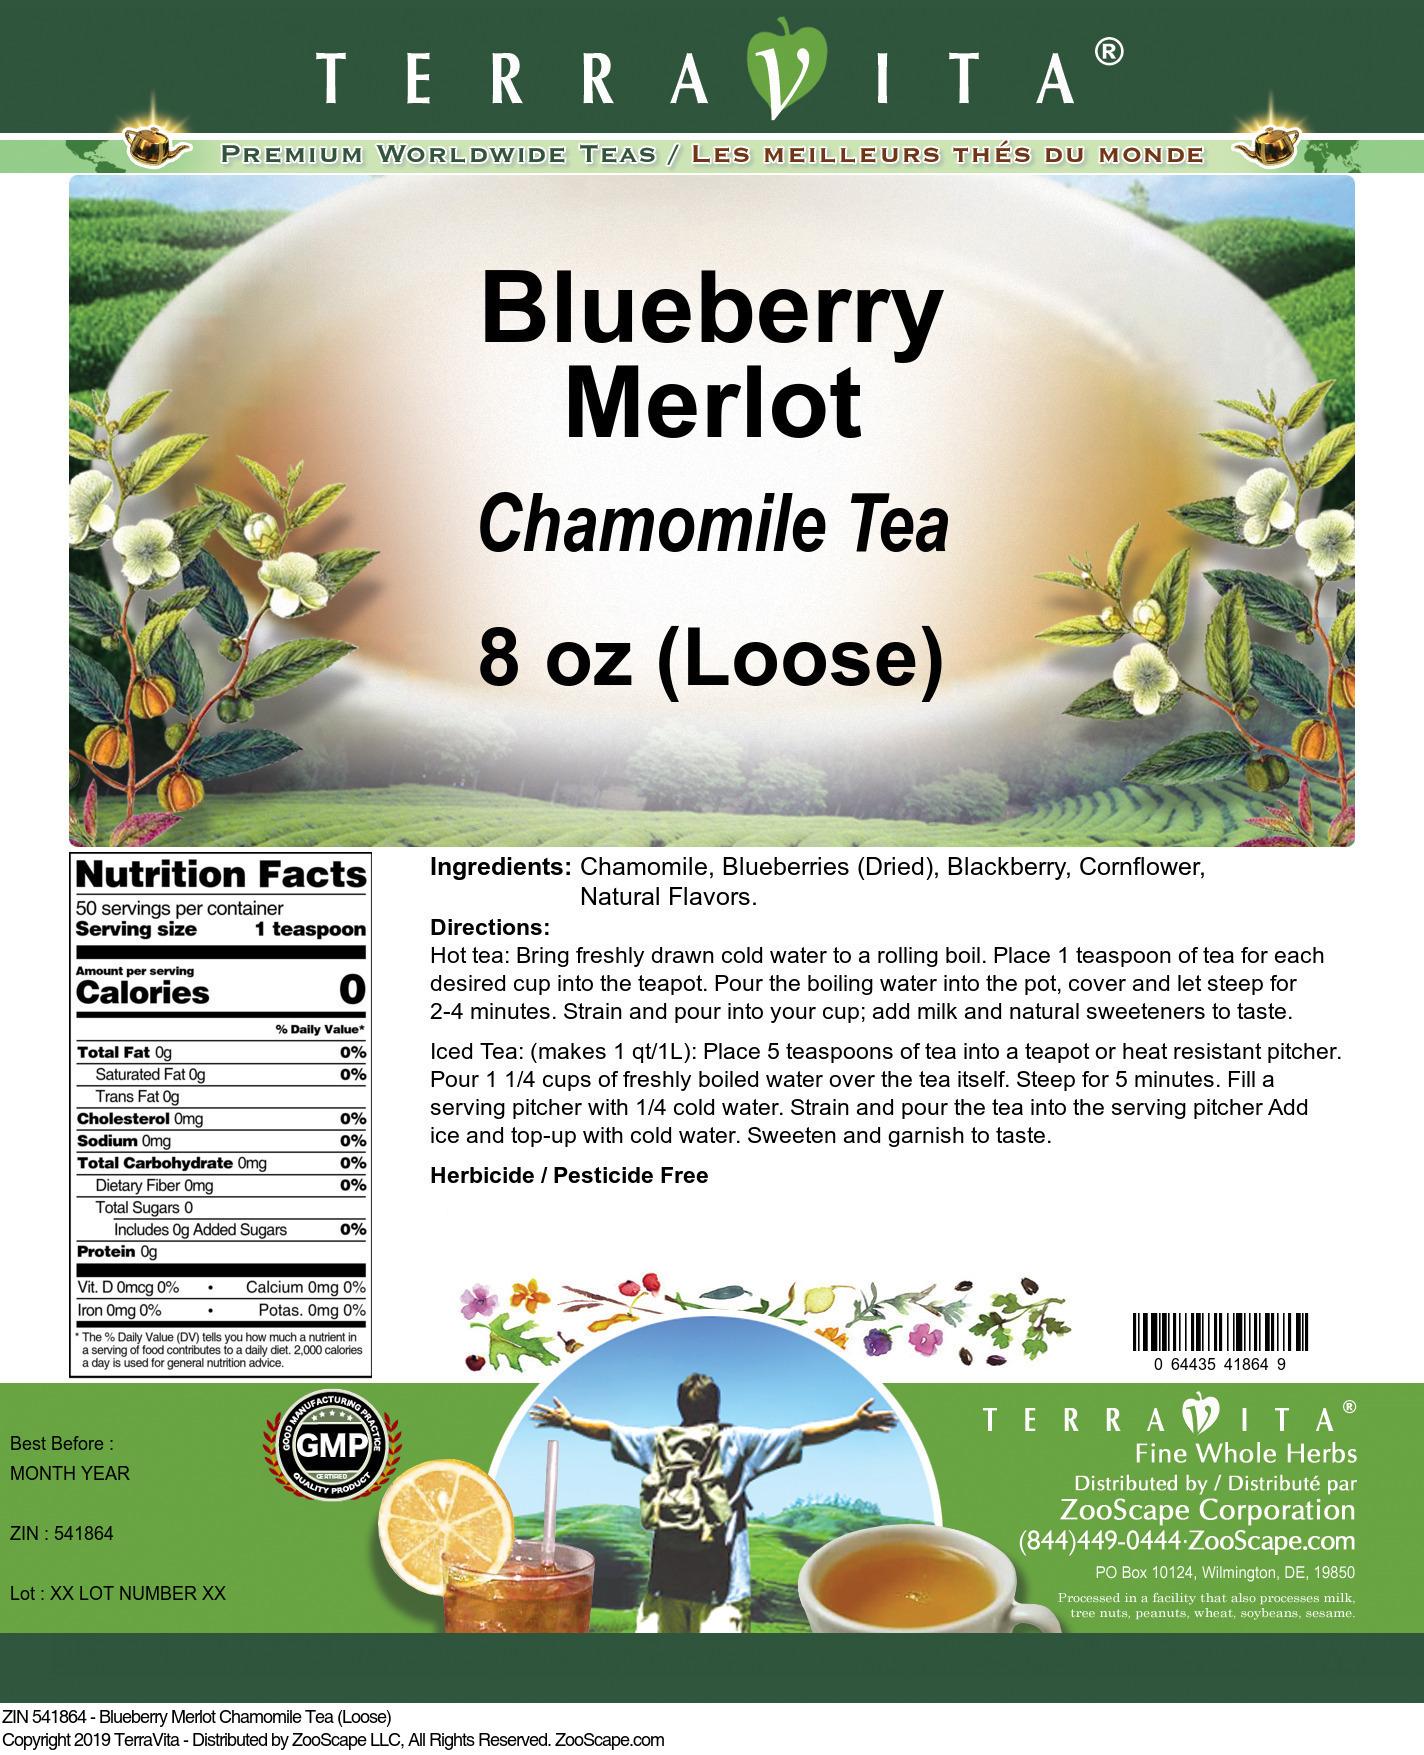 Blueberry Merlot Chamomile Tea (Loose)